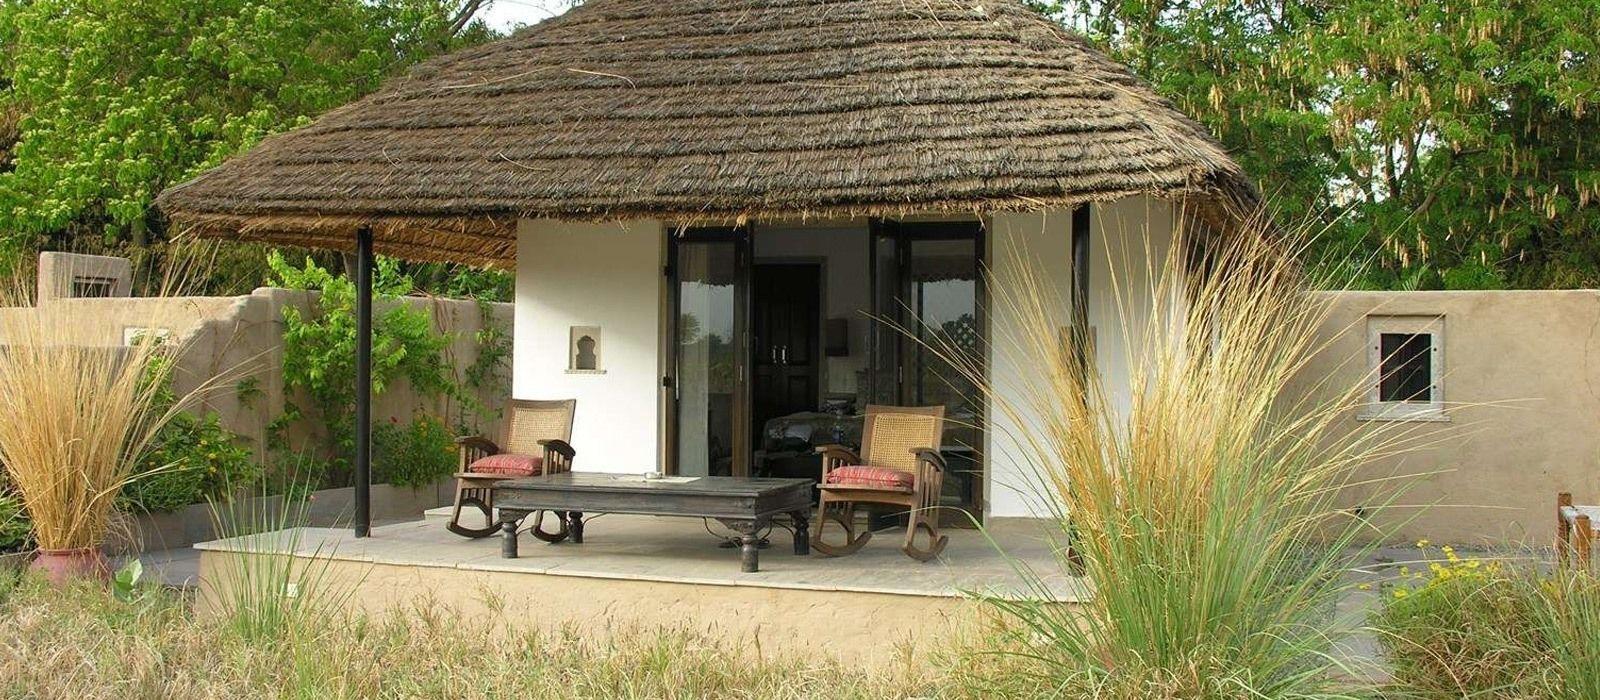 Hotel Khem Villas North India